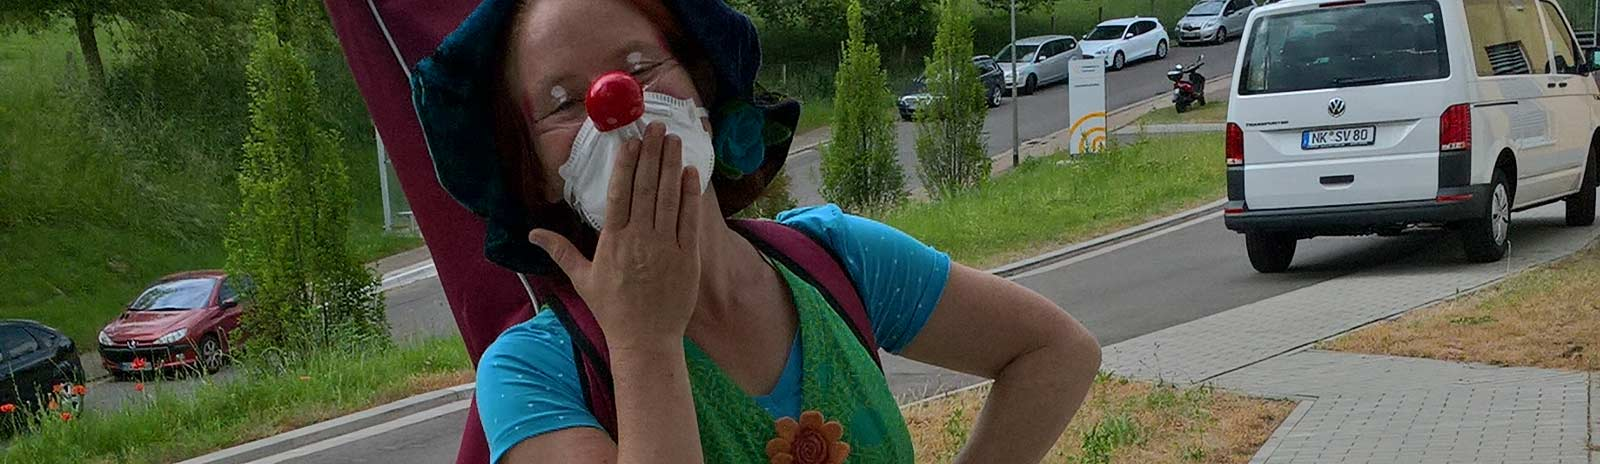 Laurentiuhsöhe_Clown_slider